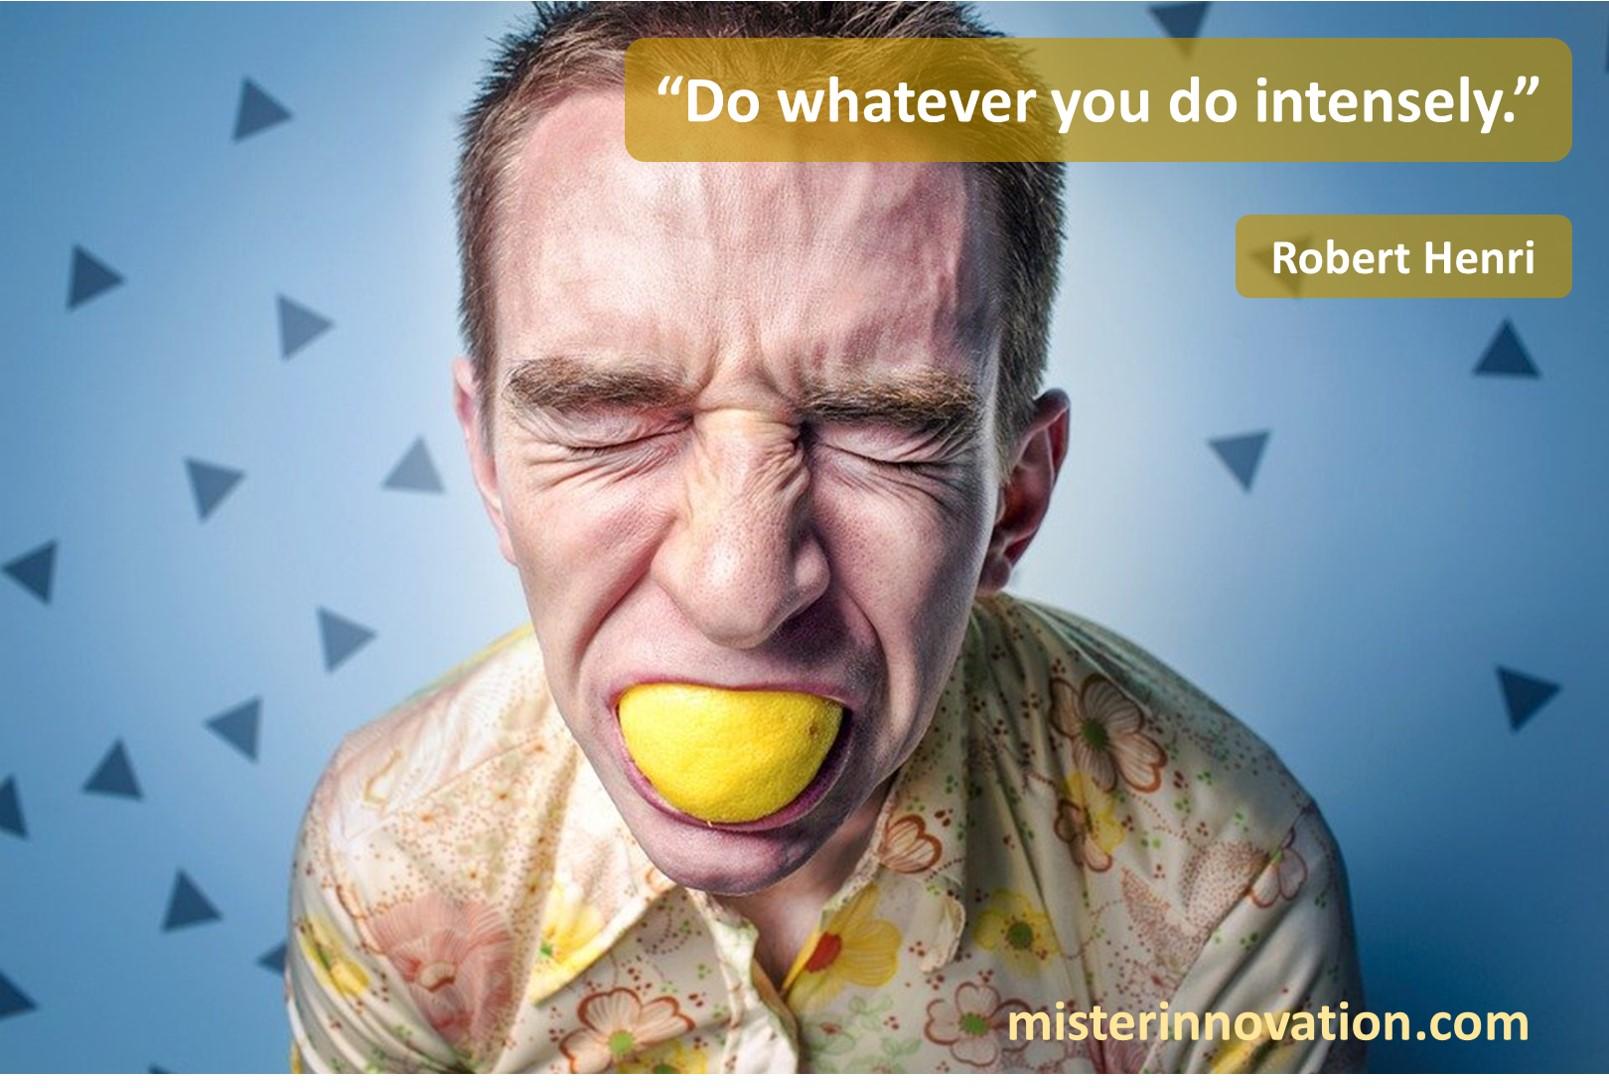 Robert Henri Intensity